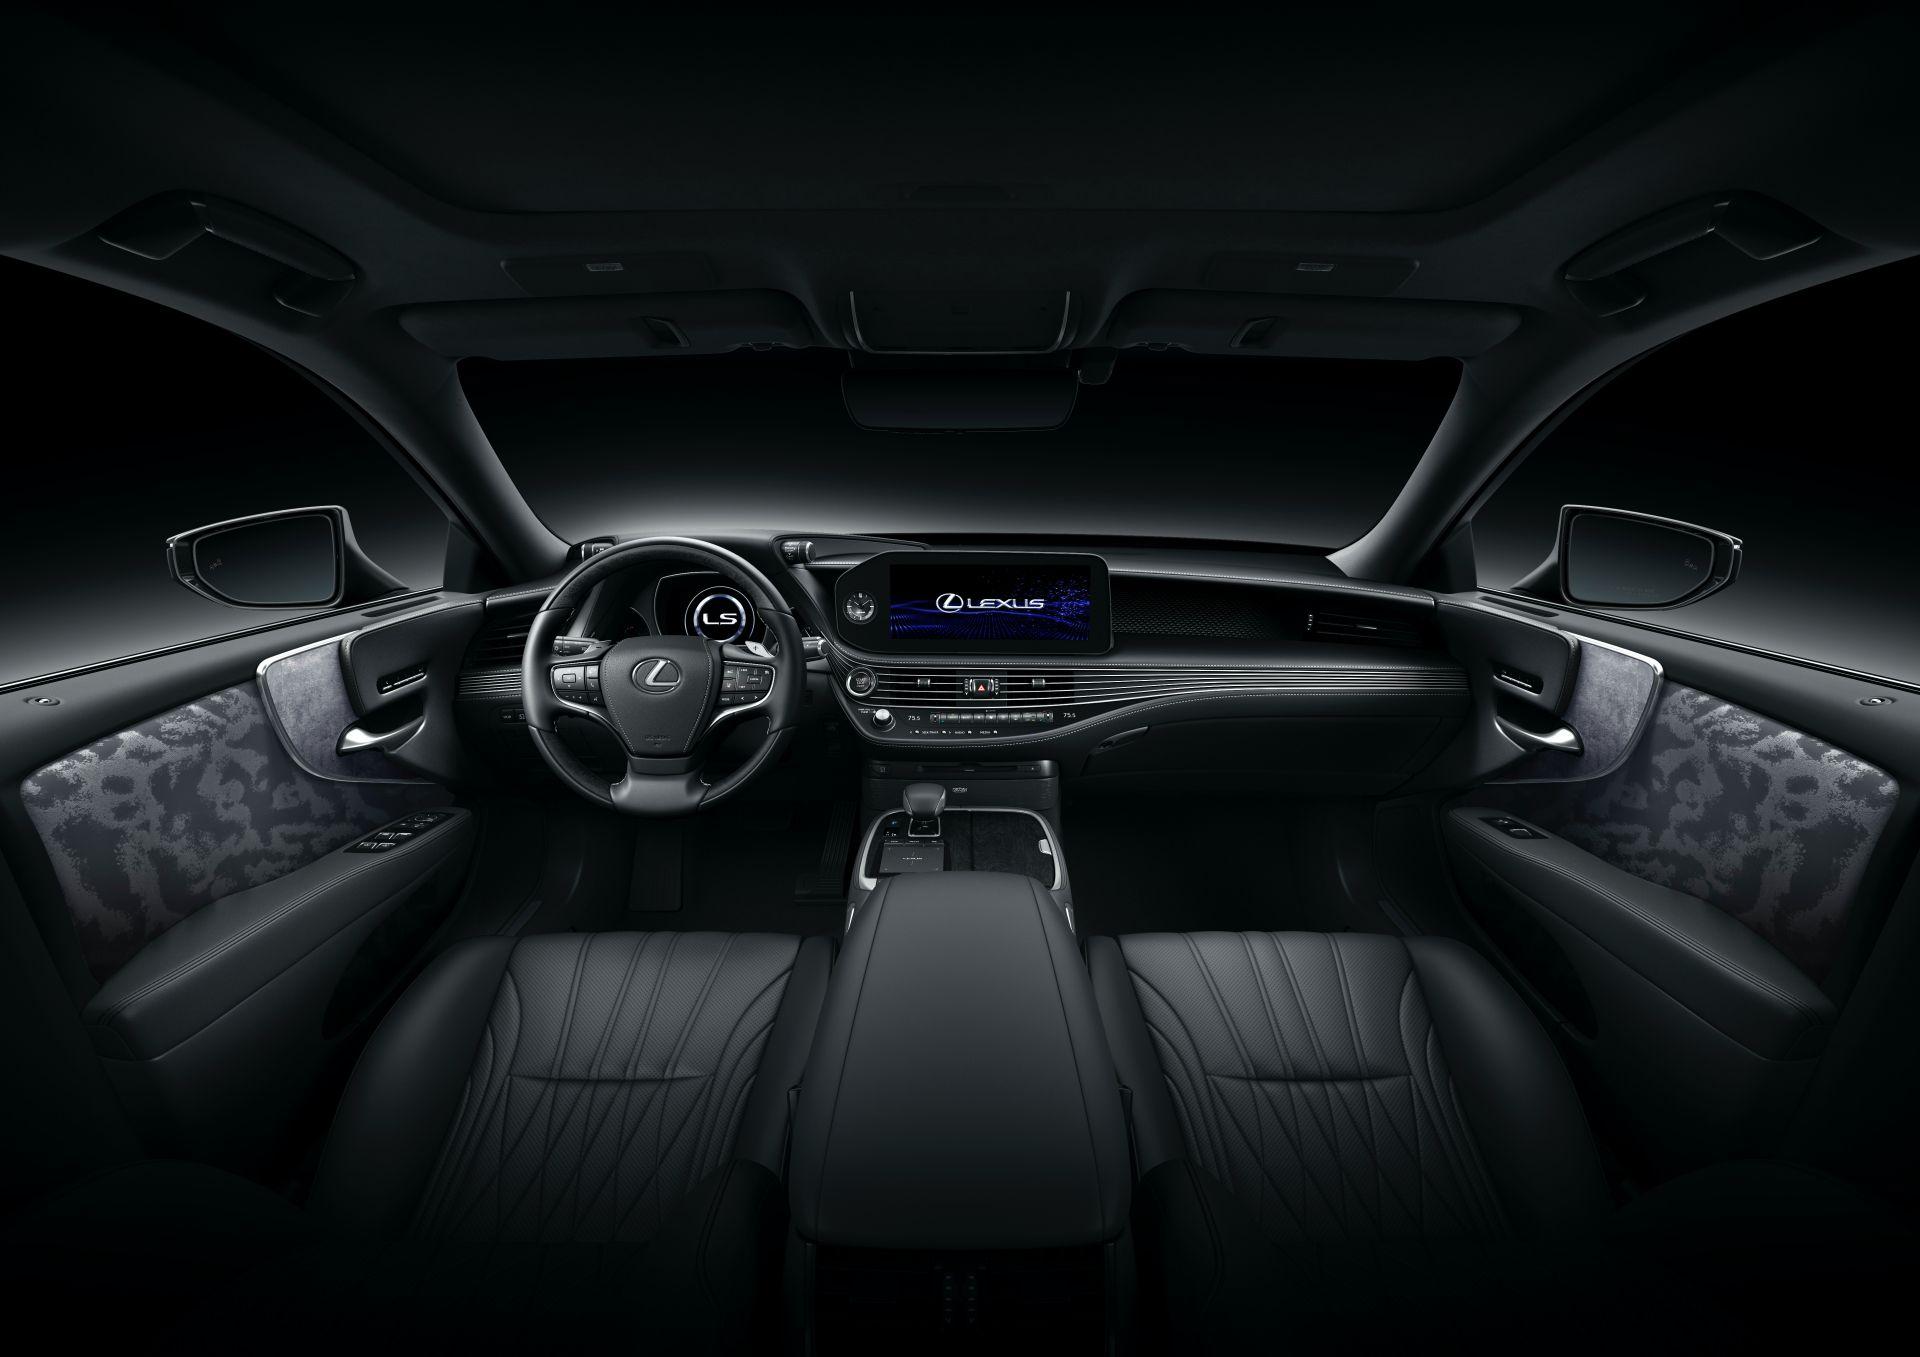 2021-lexus-ls-facelift-19.jpg